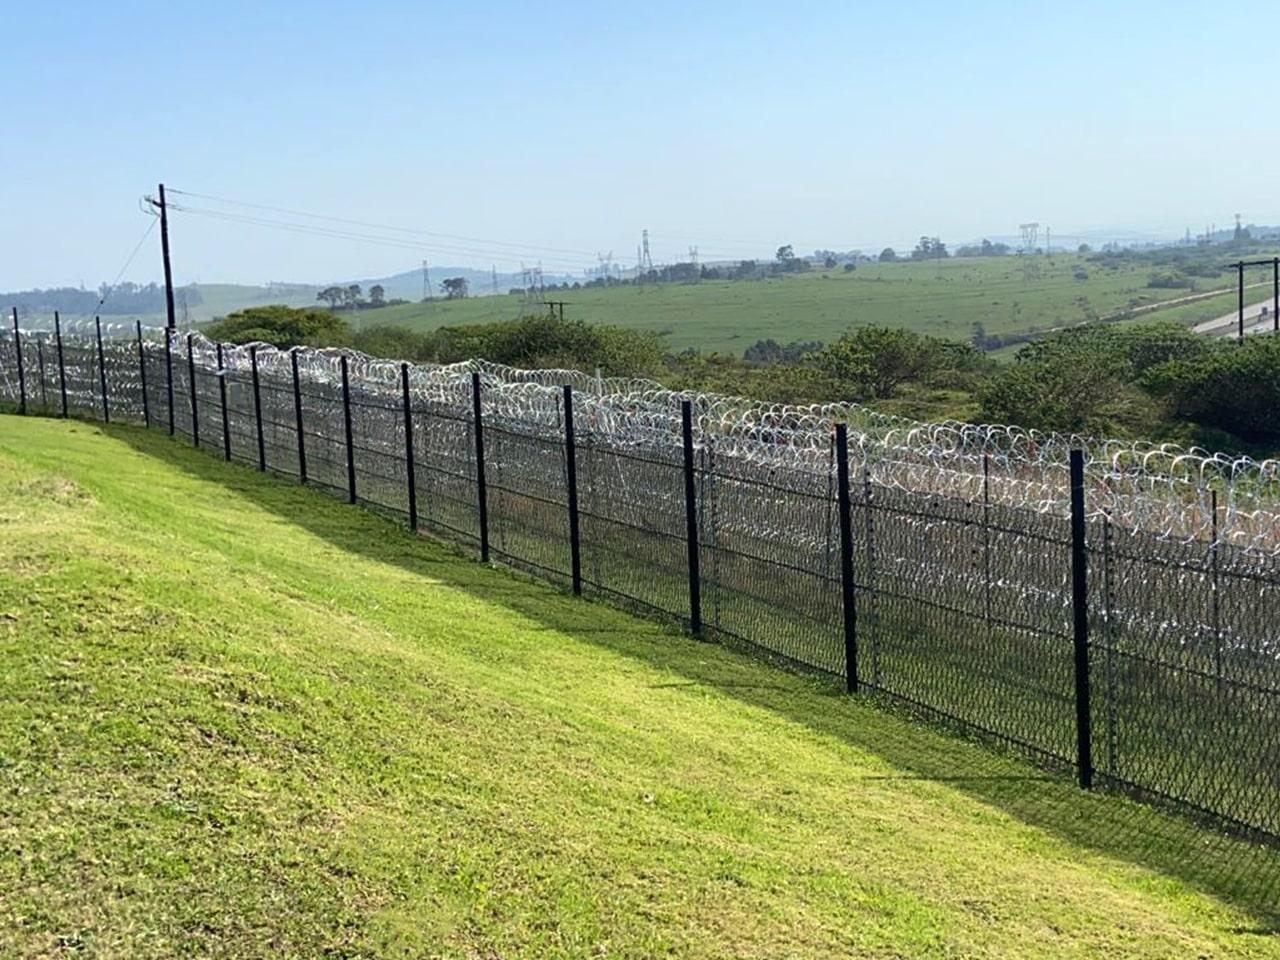 Two layers of perimeter protection razor wire mesh and concertina razor wire wall